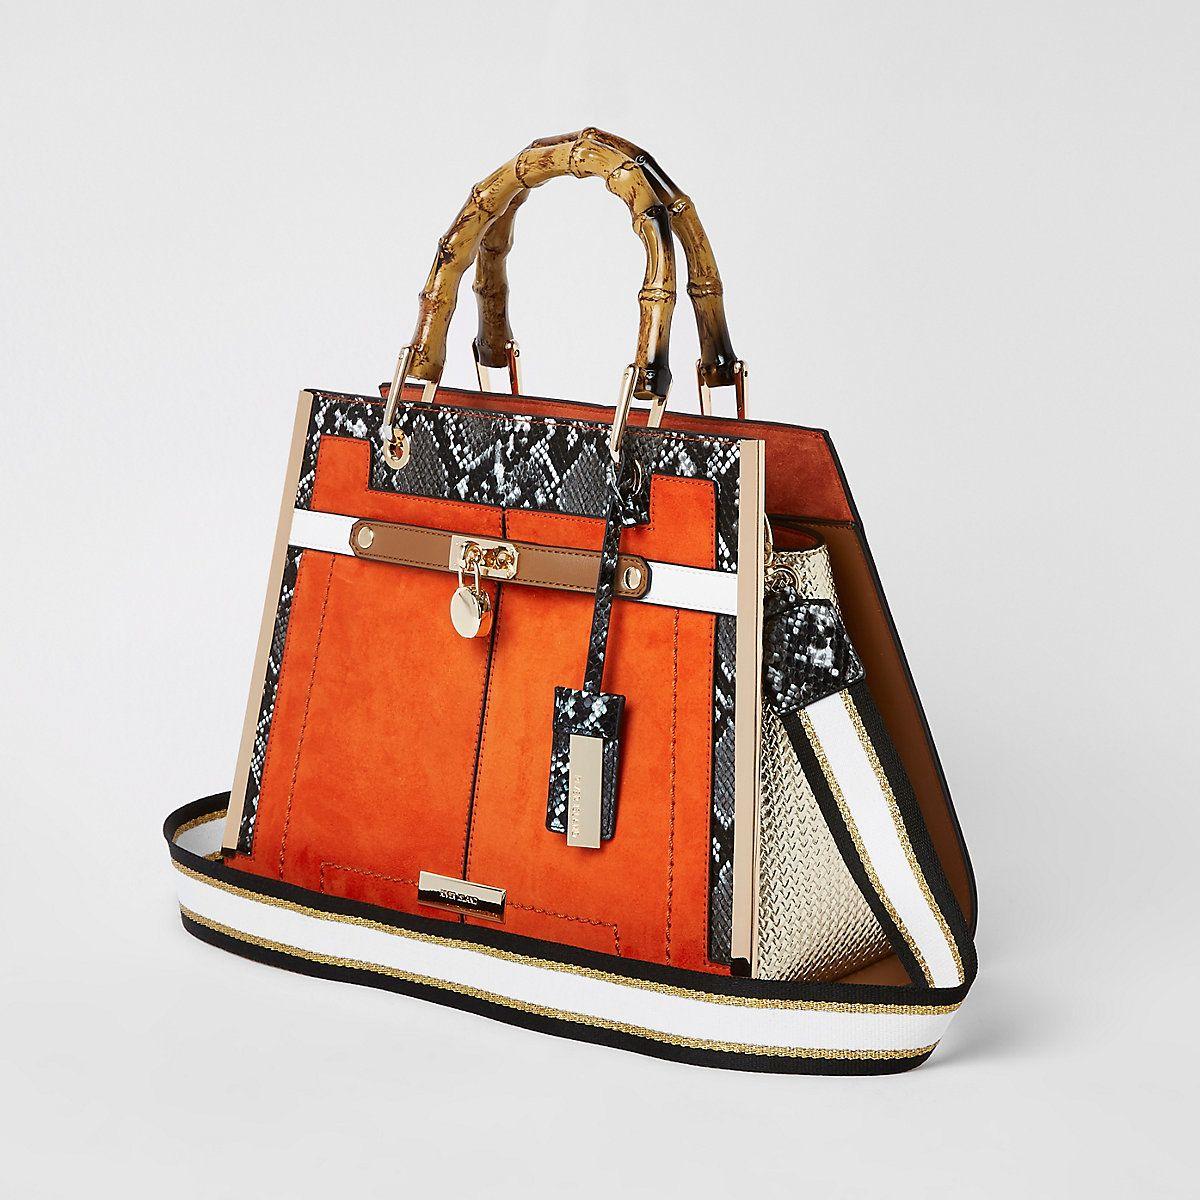 ed28de900 Orange lock front bamboo handle tote bag - Shopper & Tote Bags - Bags &  Purses - women